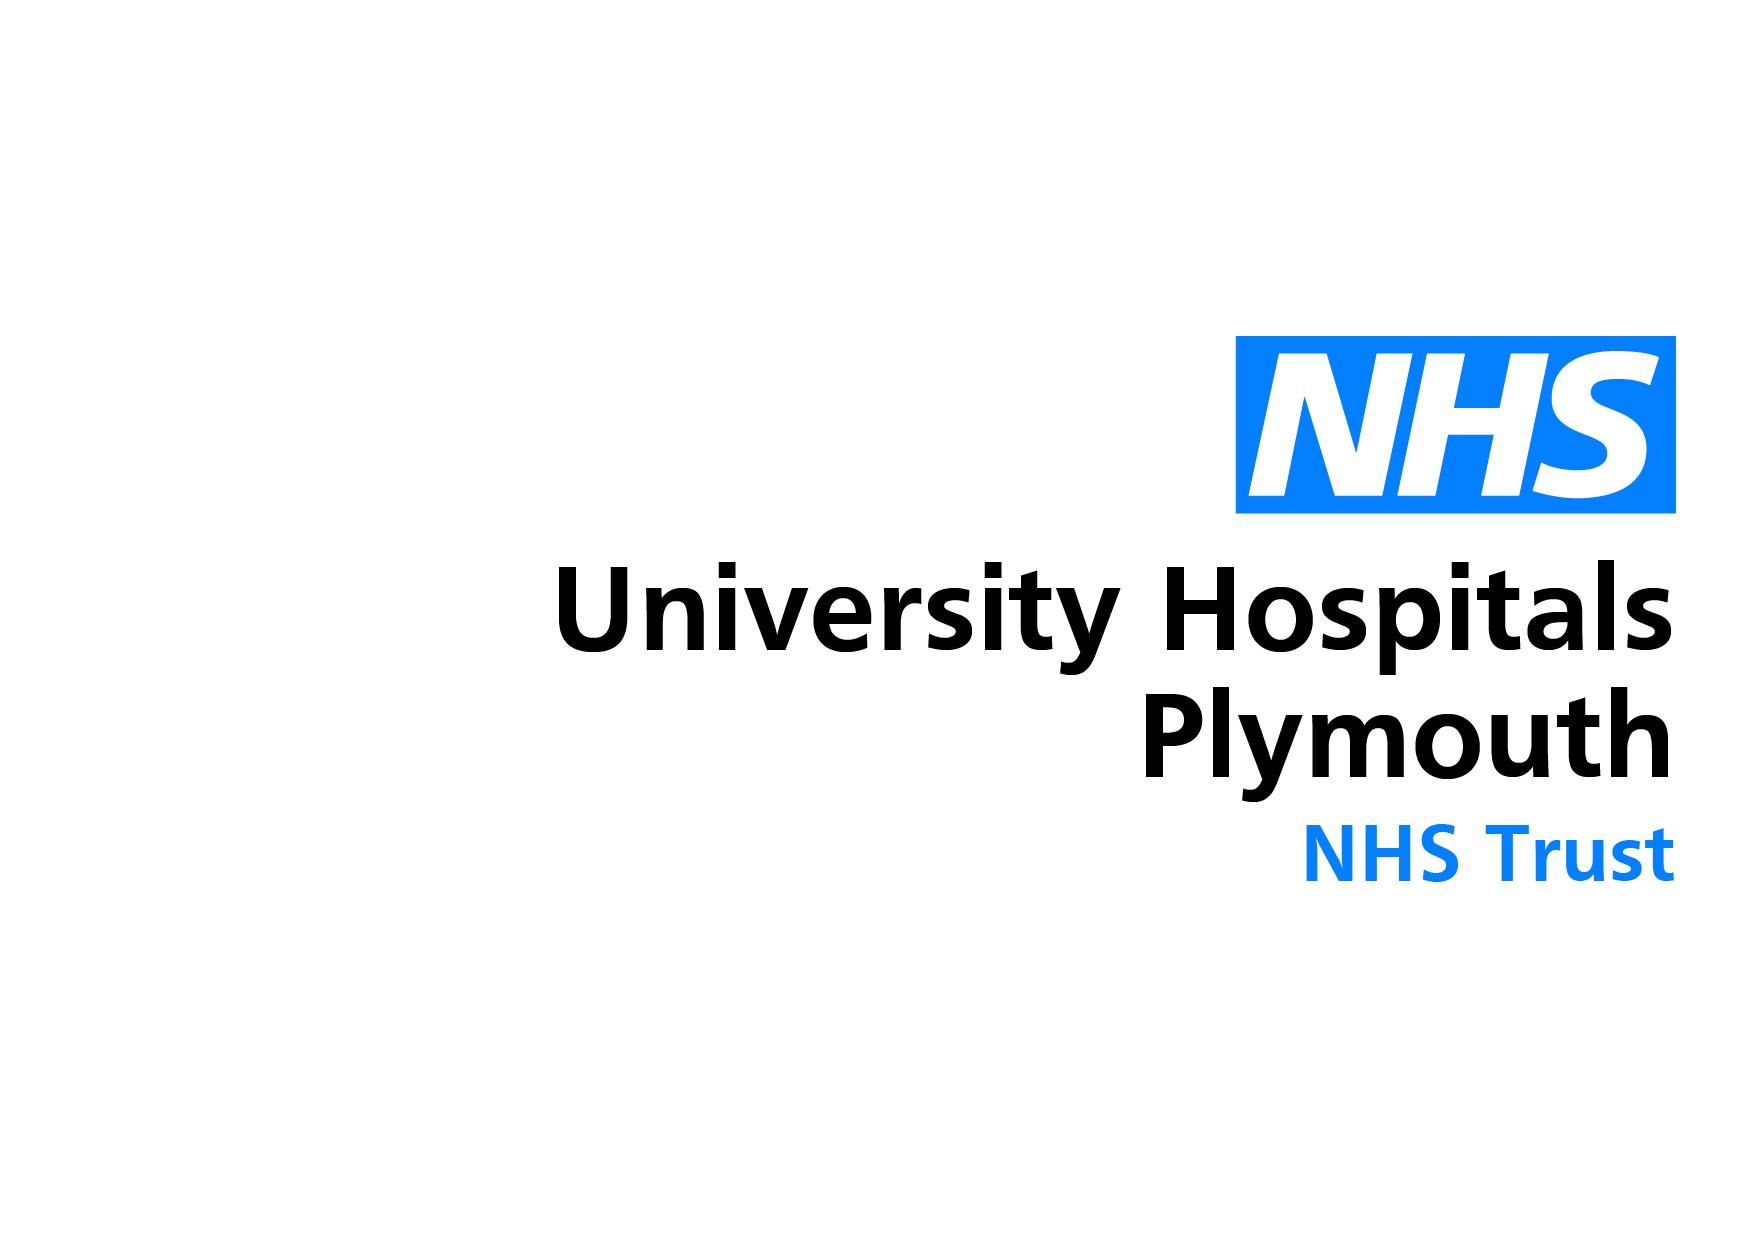 University Hospitals Plymouth NHS Logo